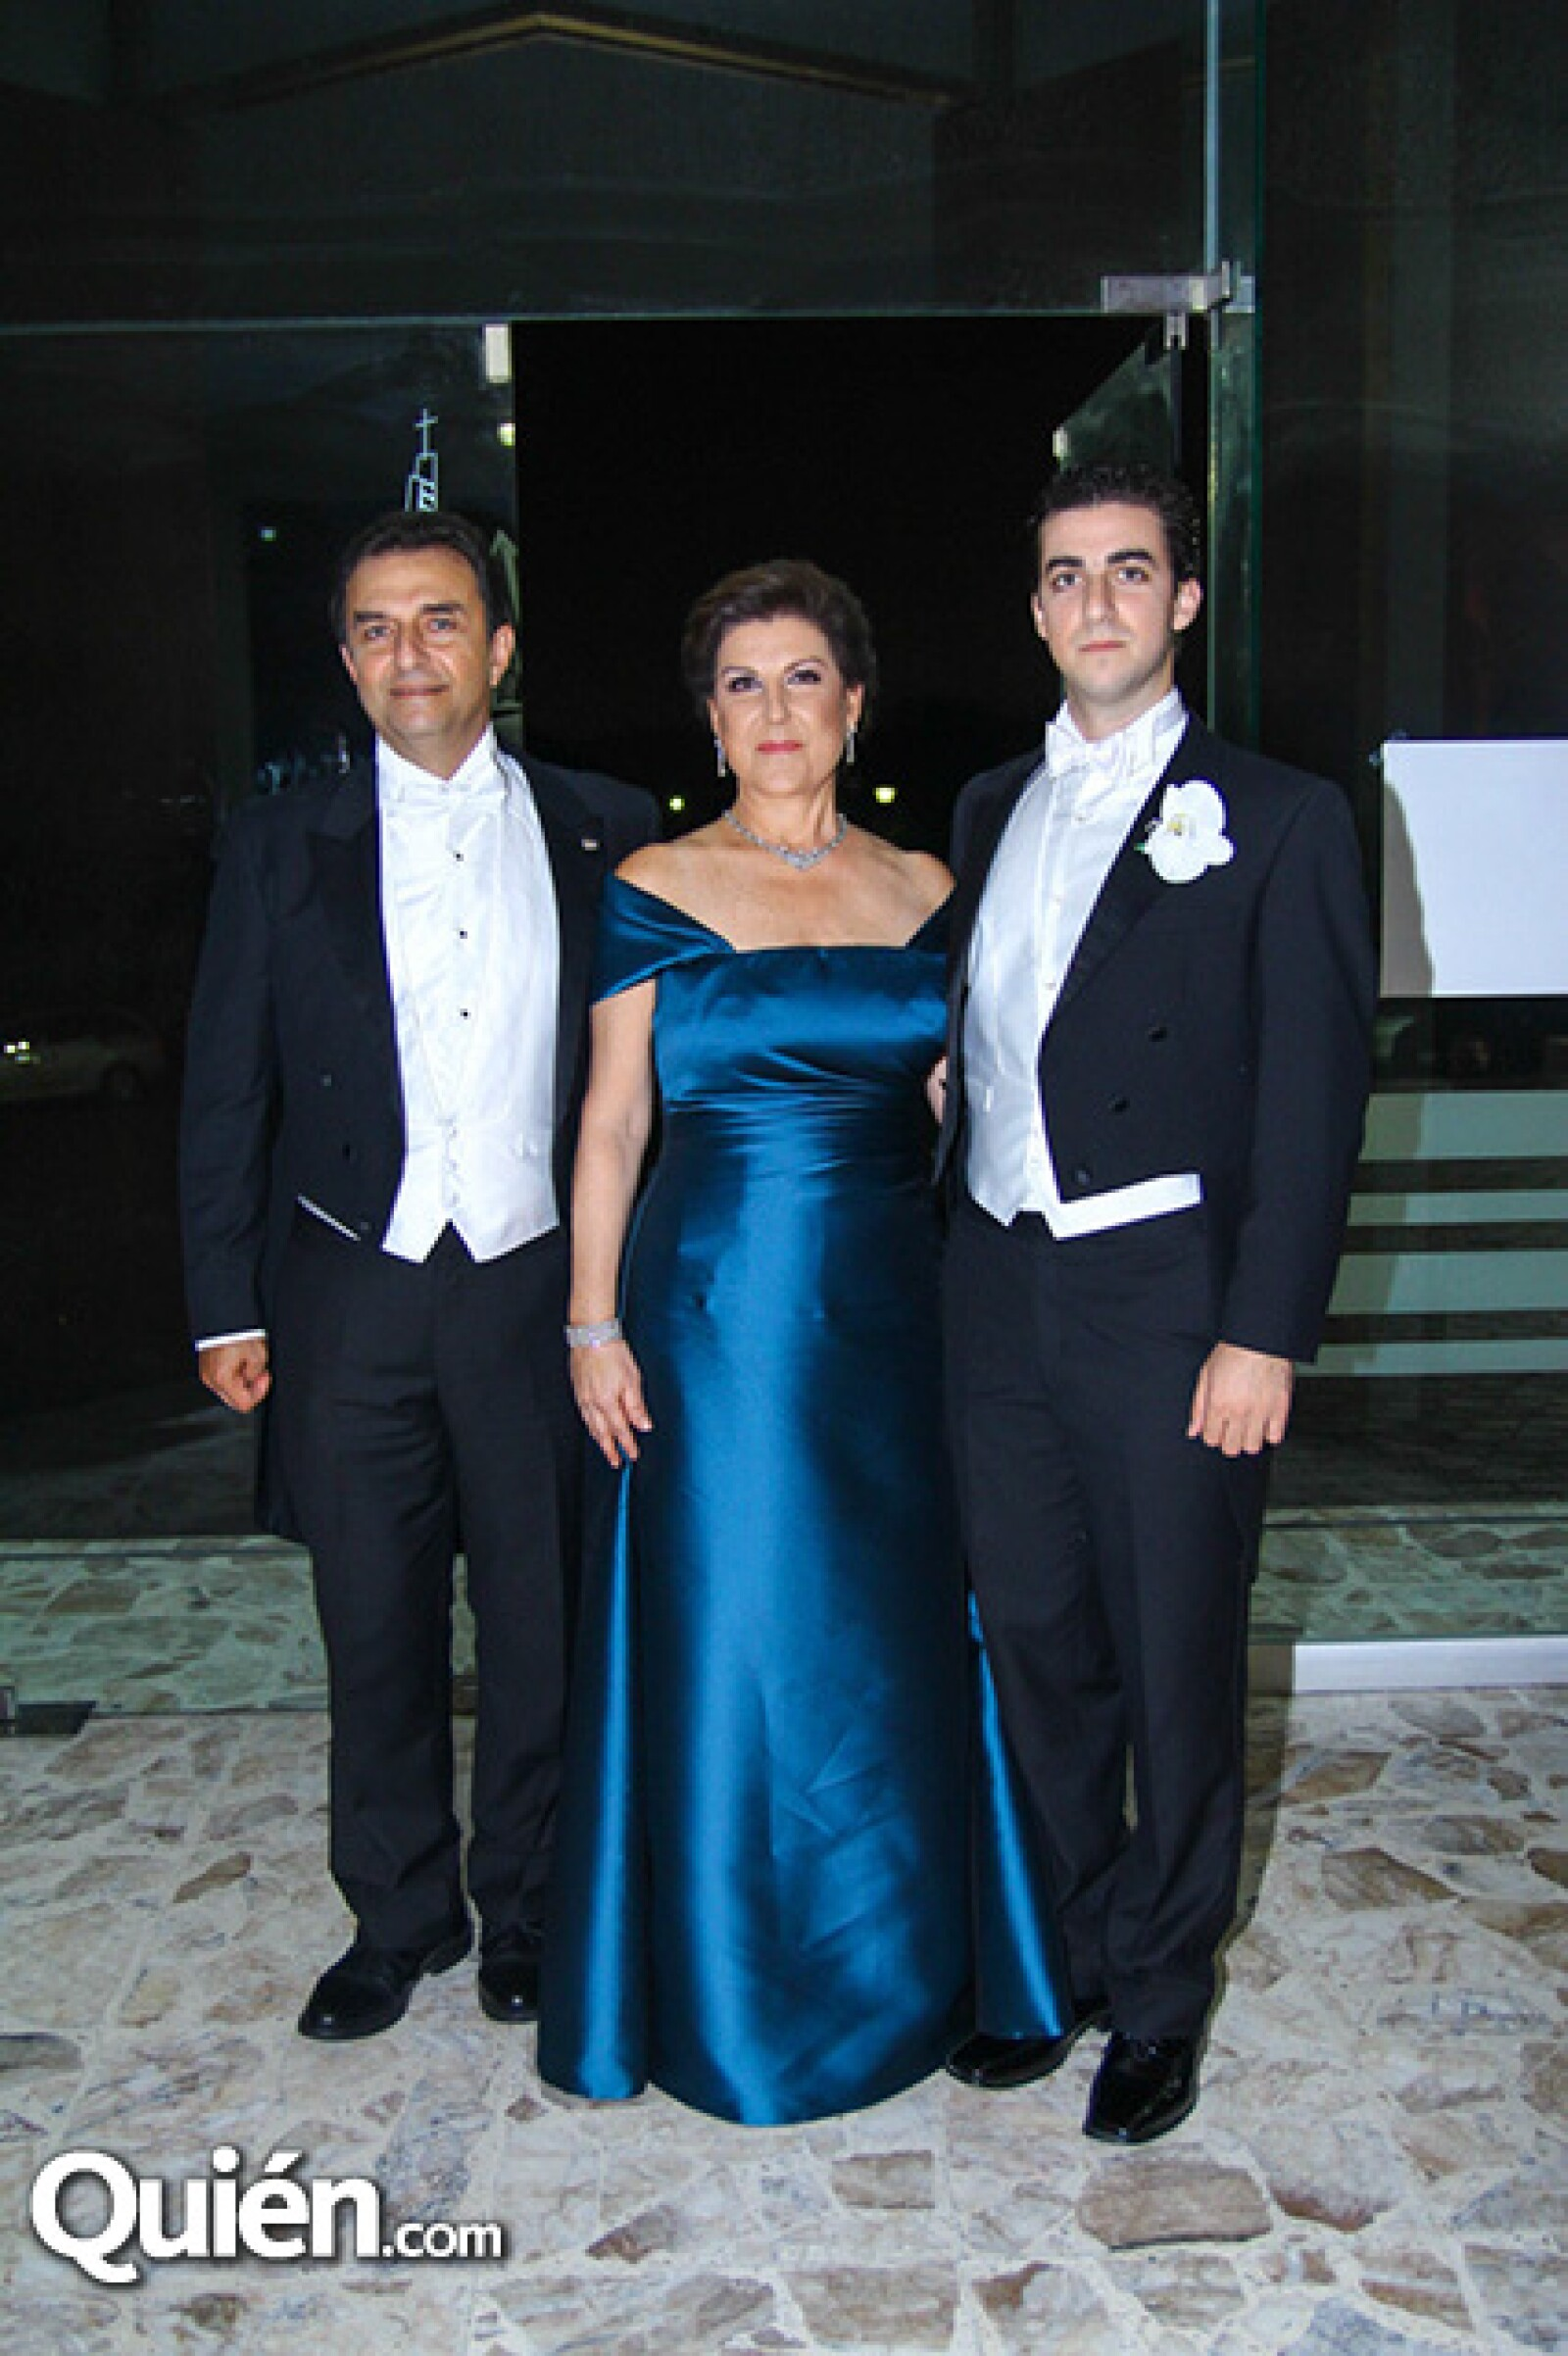 Eduardo Esper,María Eugenia Ferrigno de Esper y Juan Pablo Esper